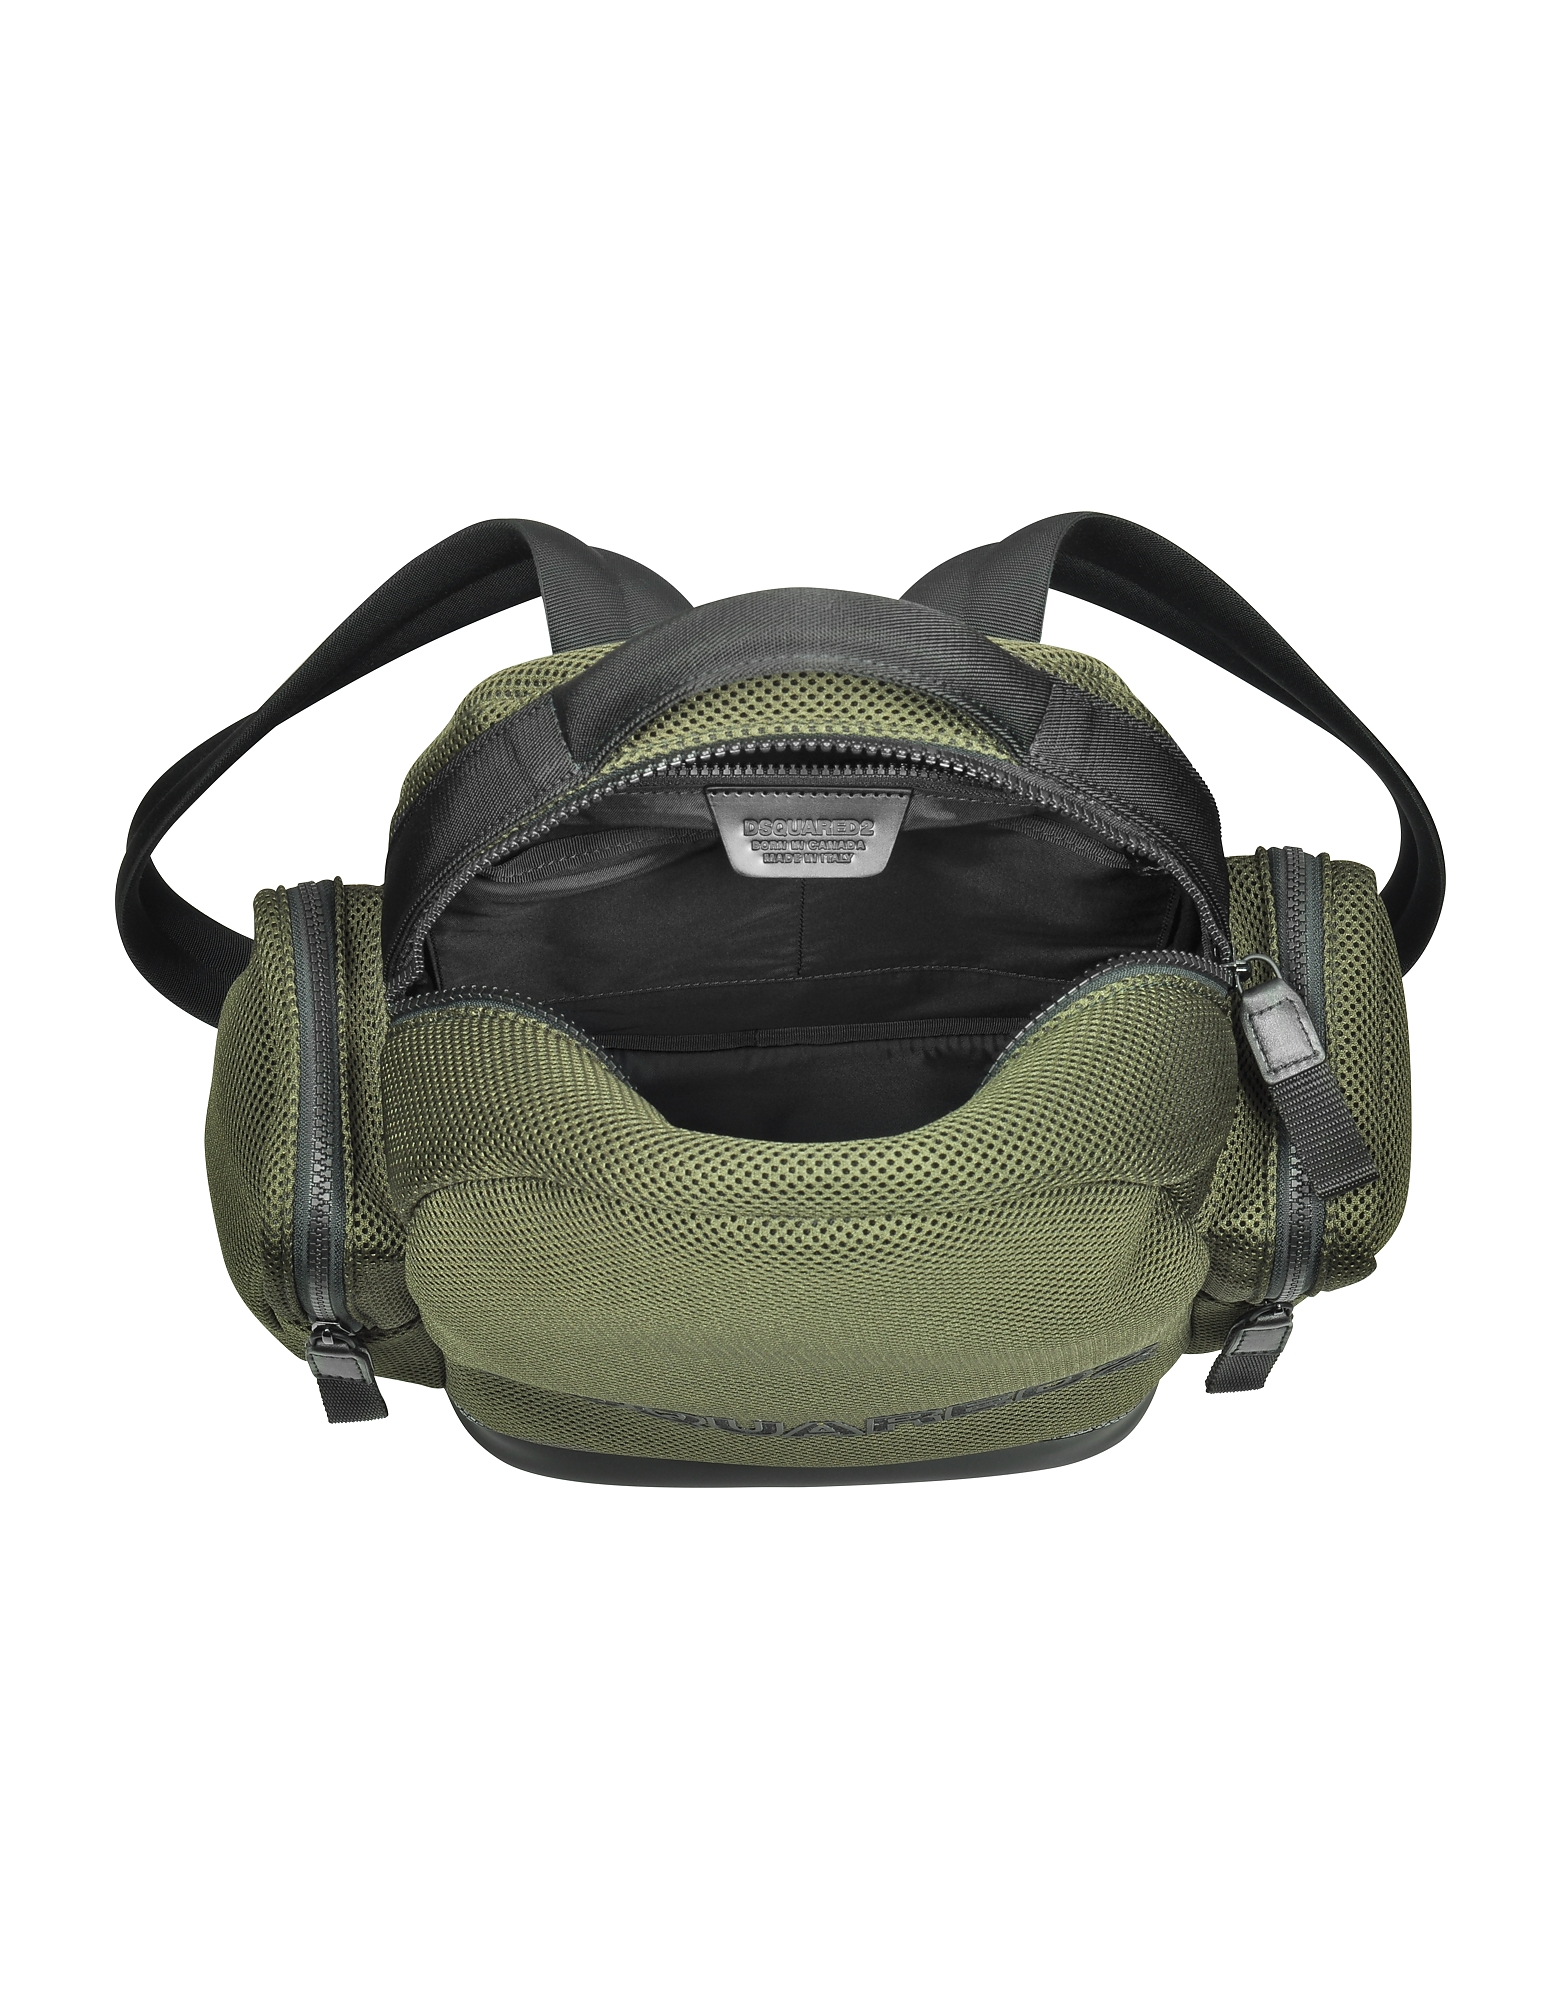 Khaki Mesh Fabric Signature Men's Backpack w/Black Accents от Forzieri.com INT